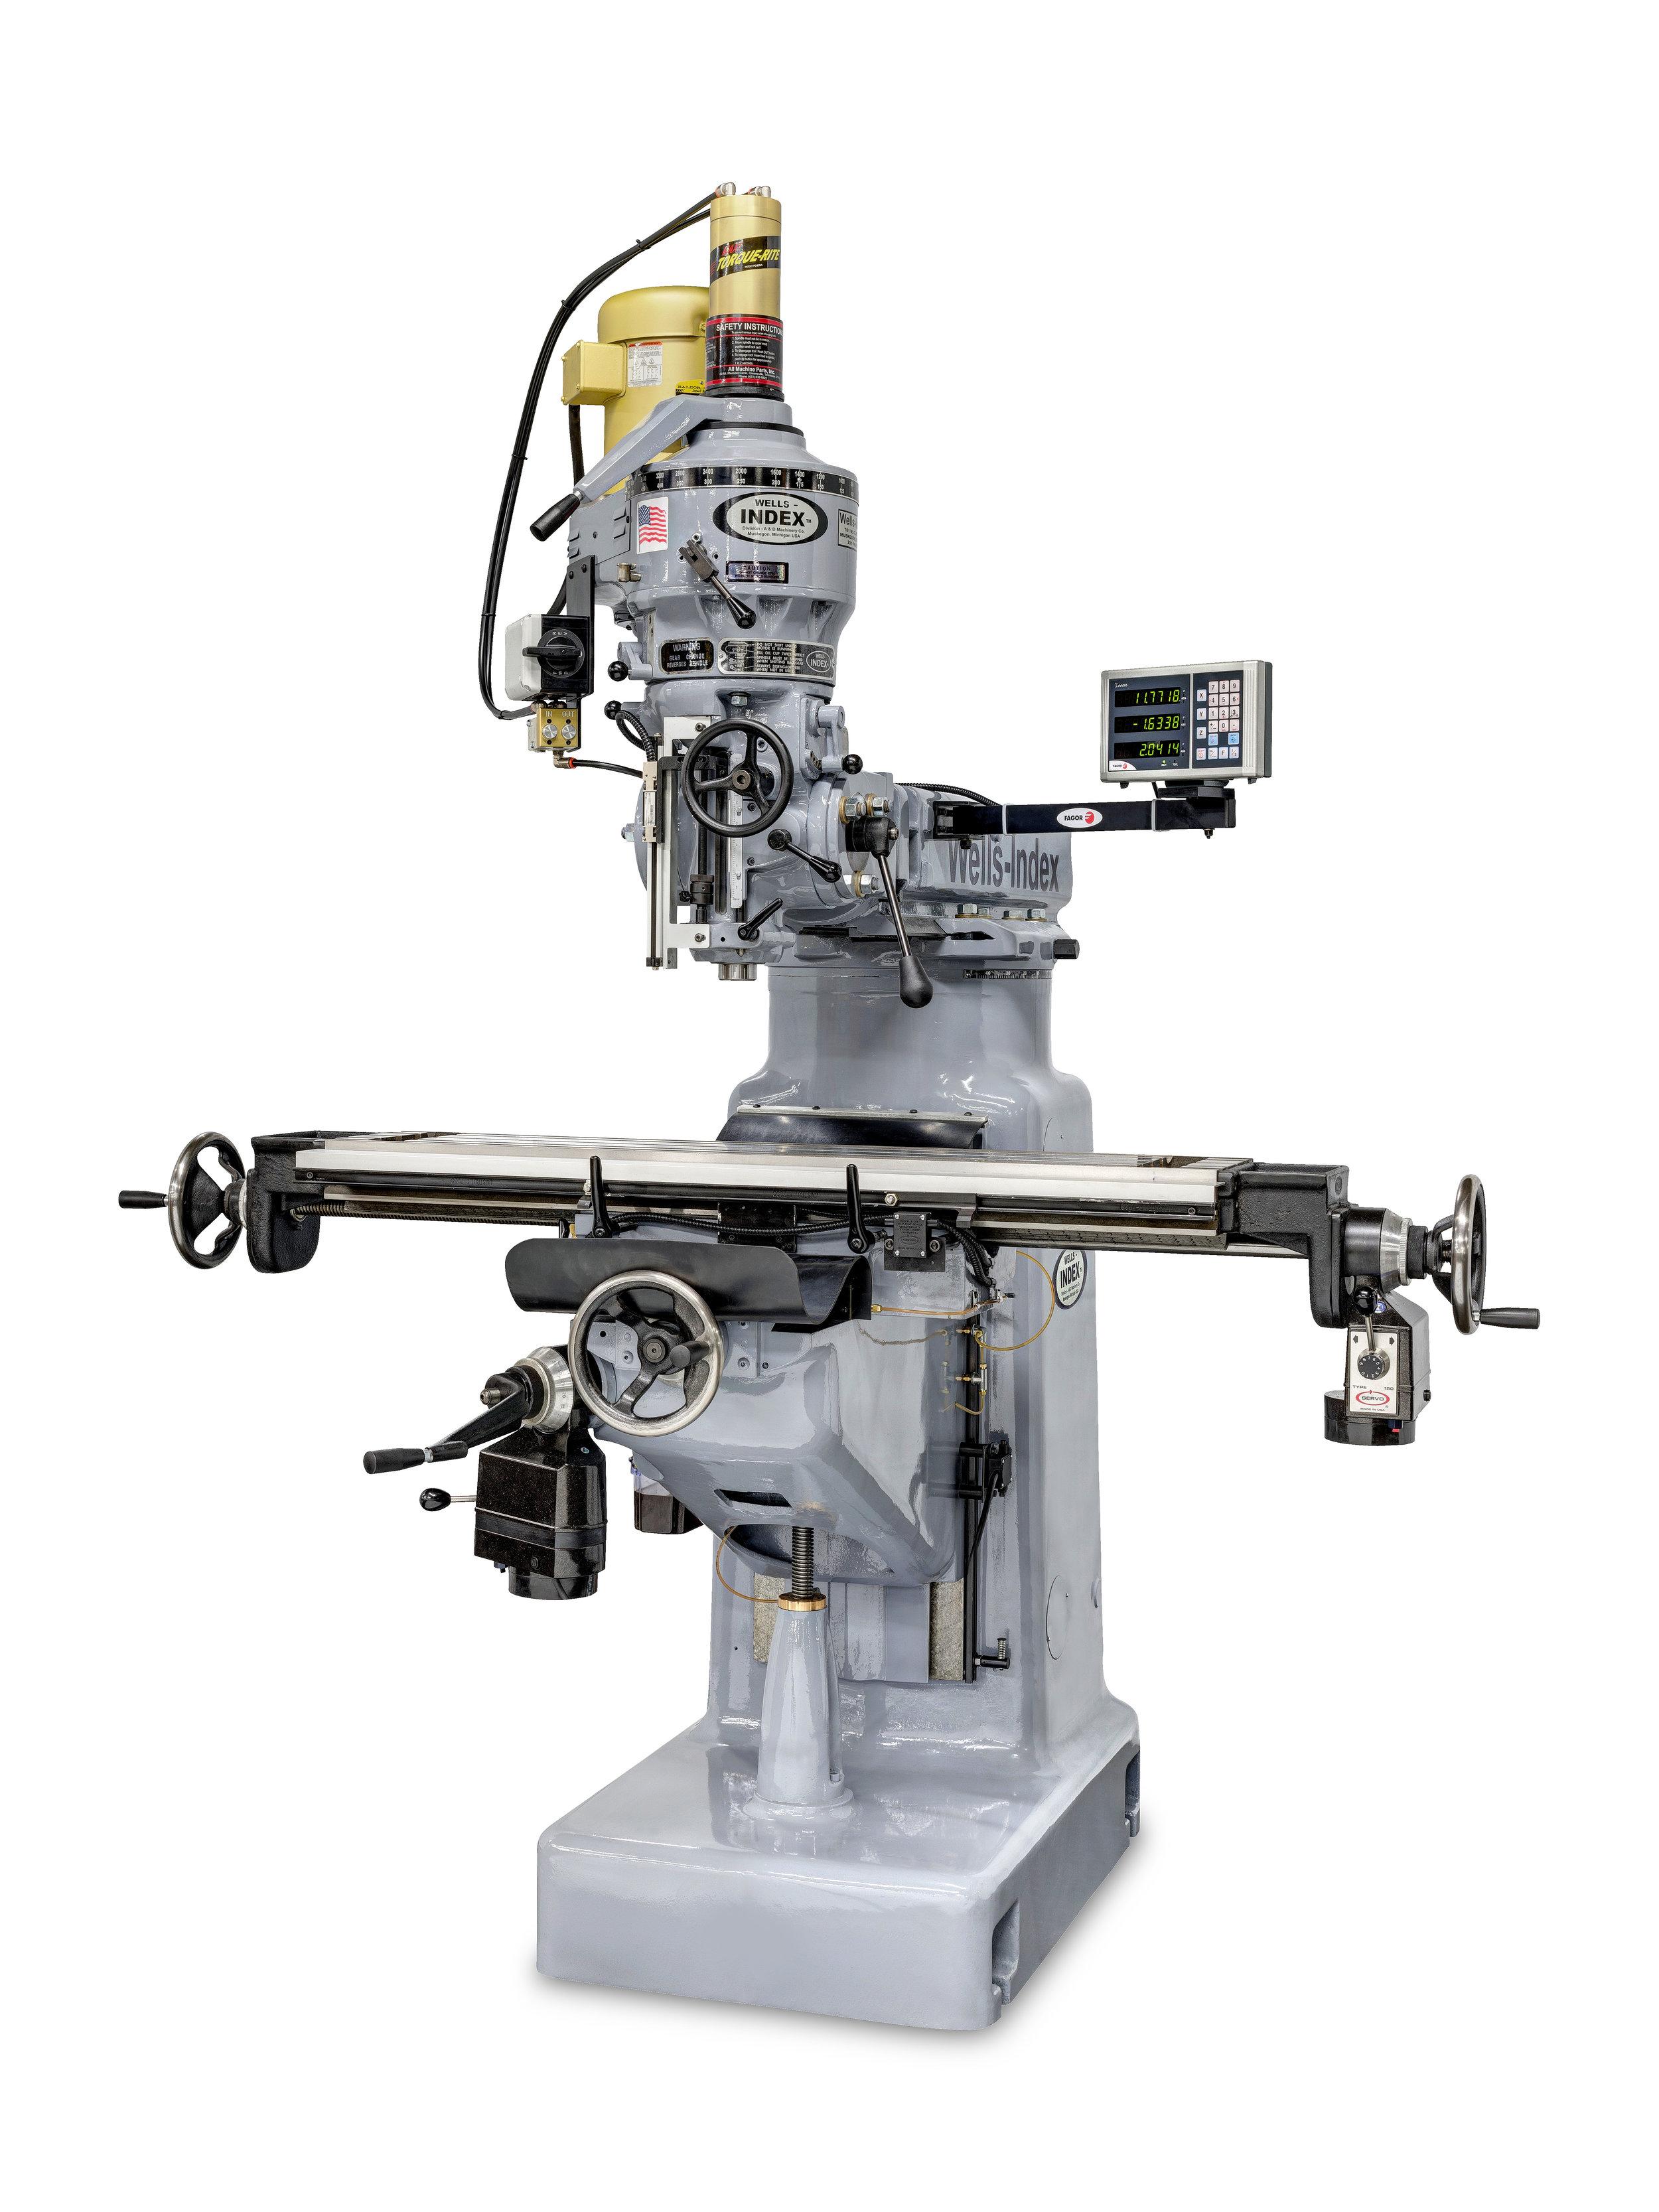 Wells-Index 847 Manual Milling Machine Blue Photon with power drawbar